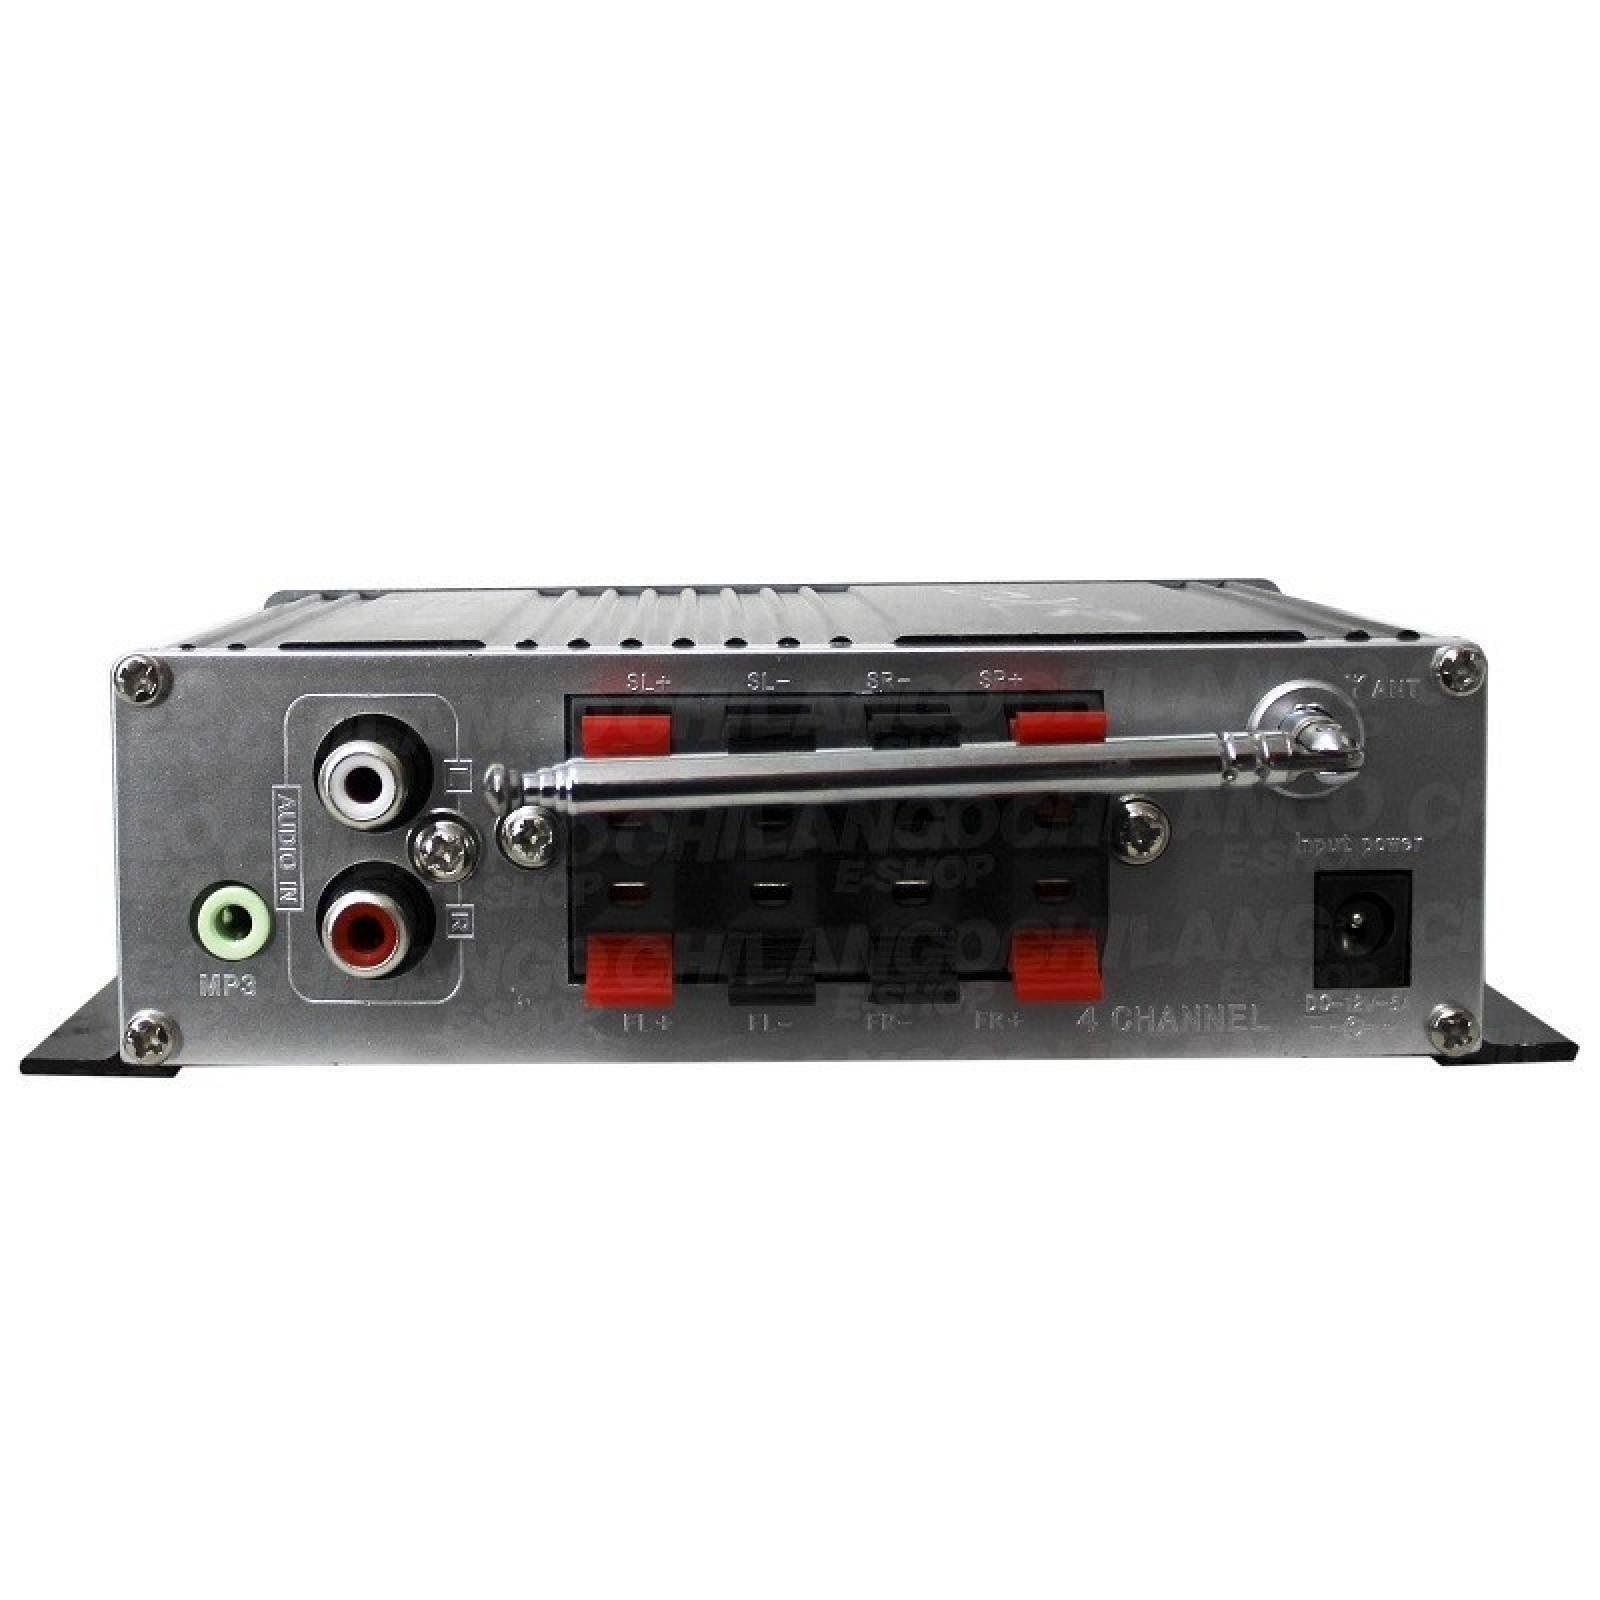 AMPLIFICADOR MINI 4 CANALES BLUETOOTH USB SD FM 010 150